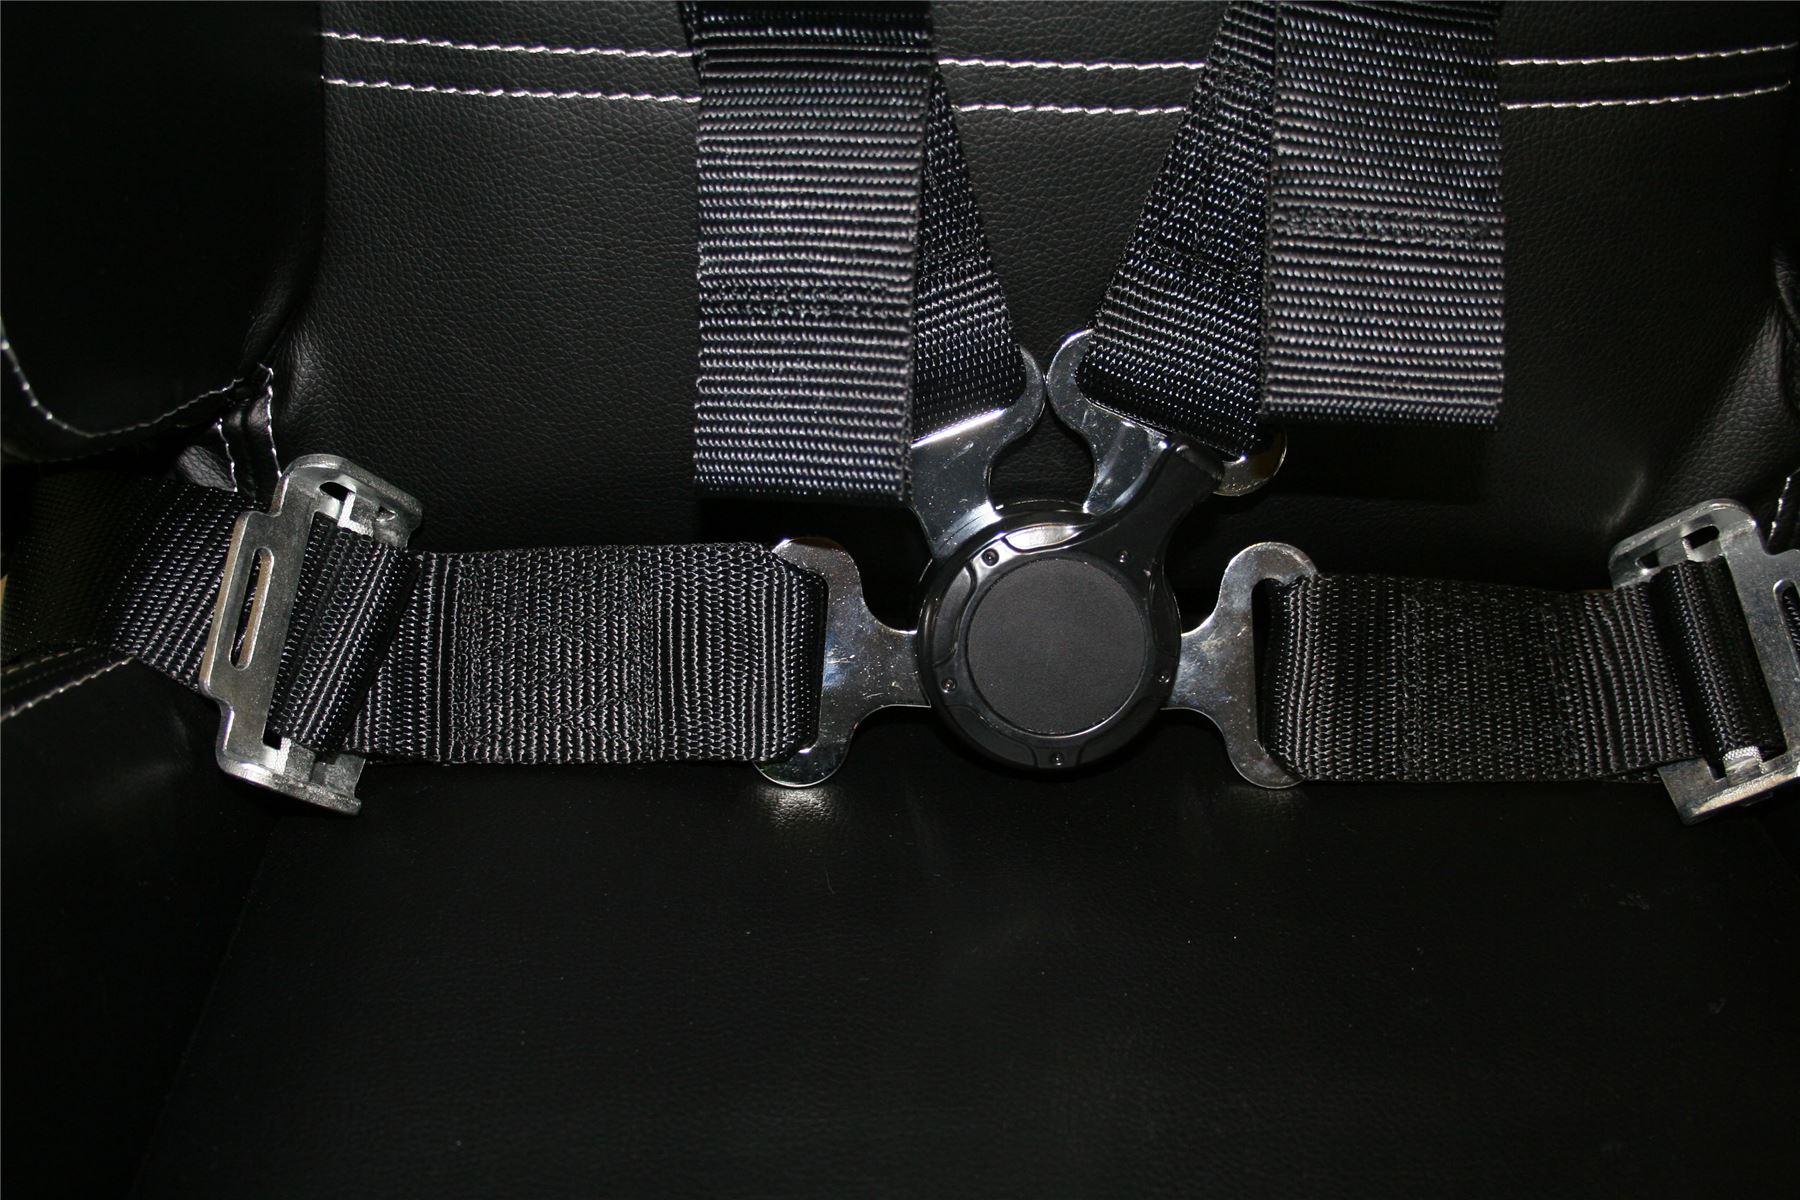 Raptor 4x4 Safety Belts 4 Points 2 Black Harness Seat Belt Off Road Racing